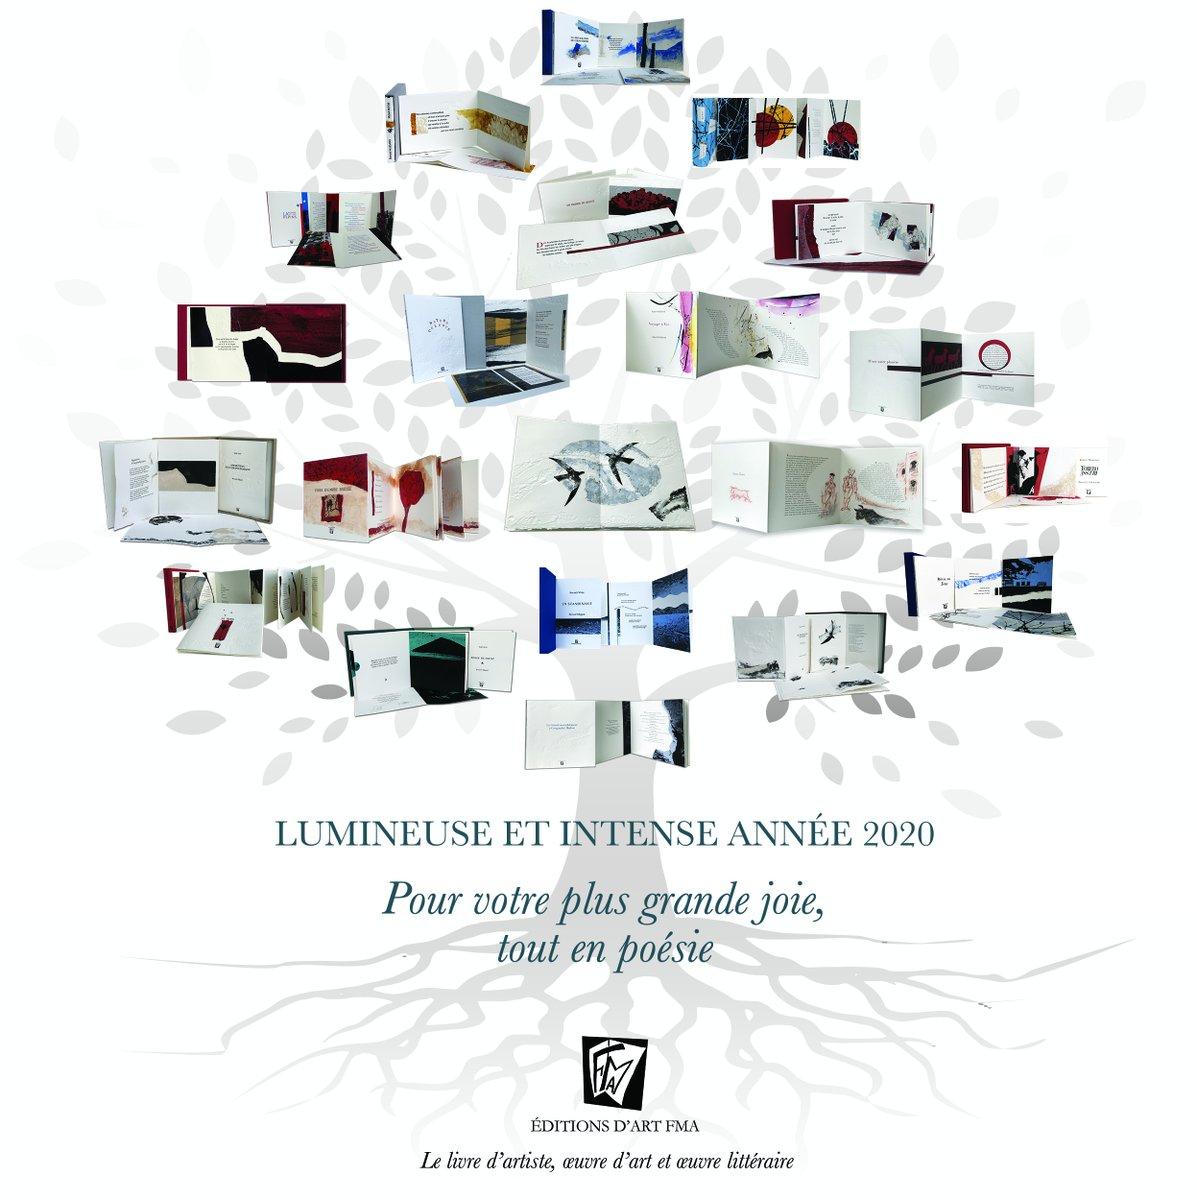 Editionsfma Hashtag On Twitter serapportantà Poeme Voeux Nouvel An